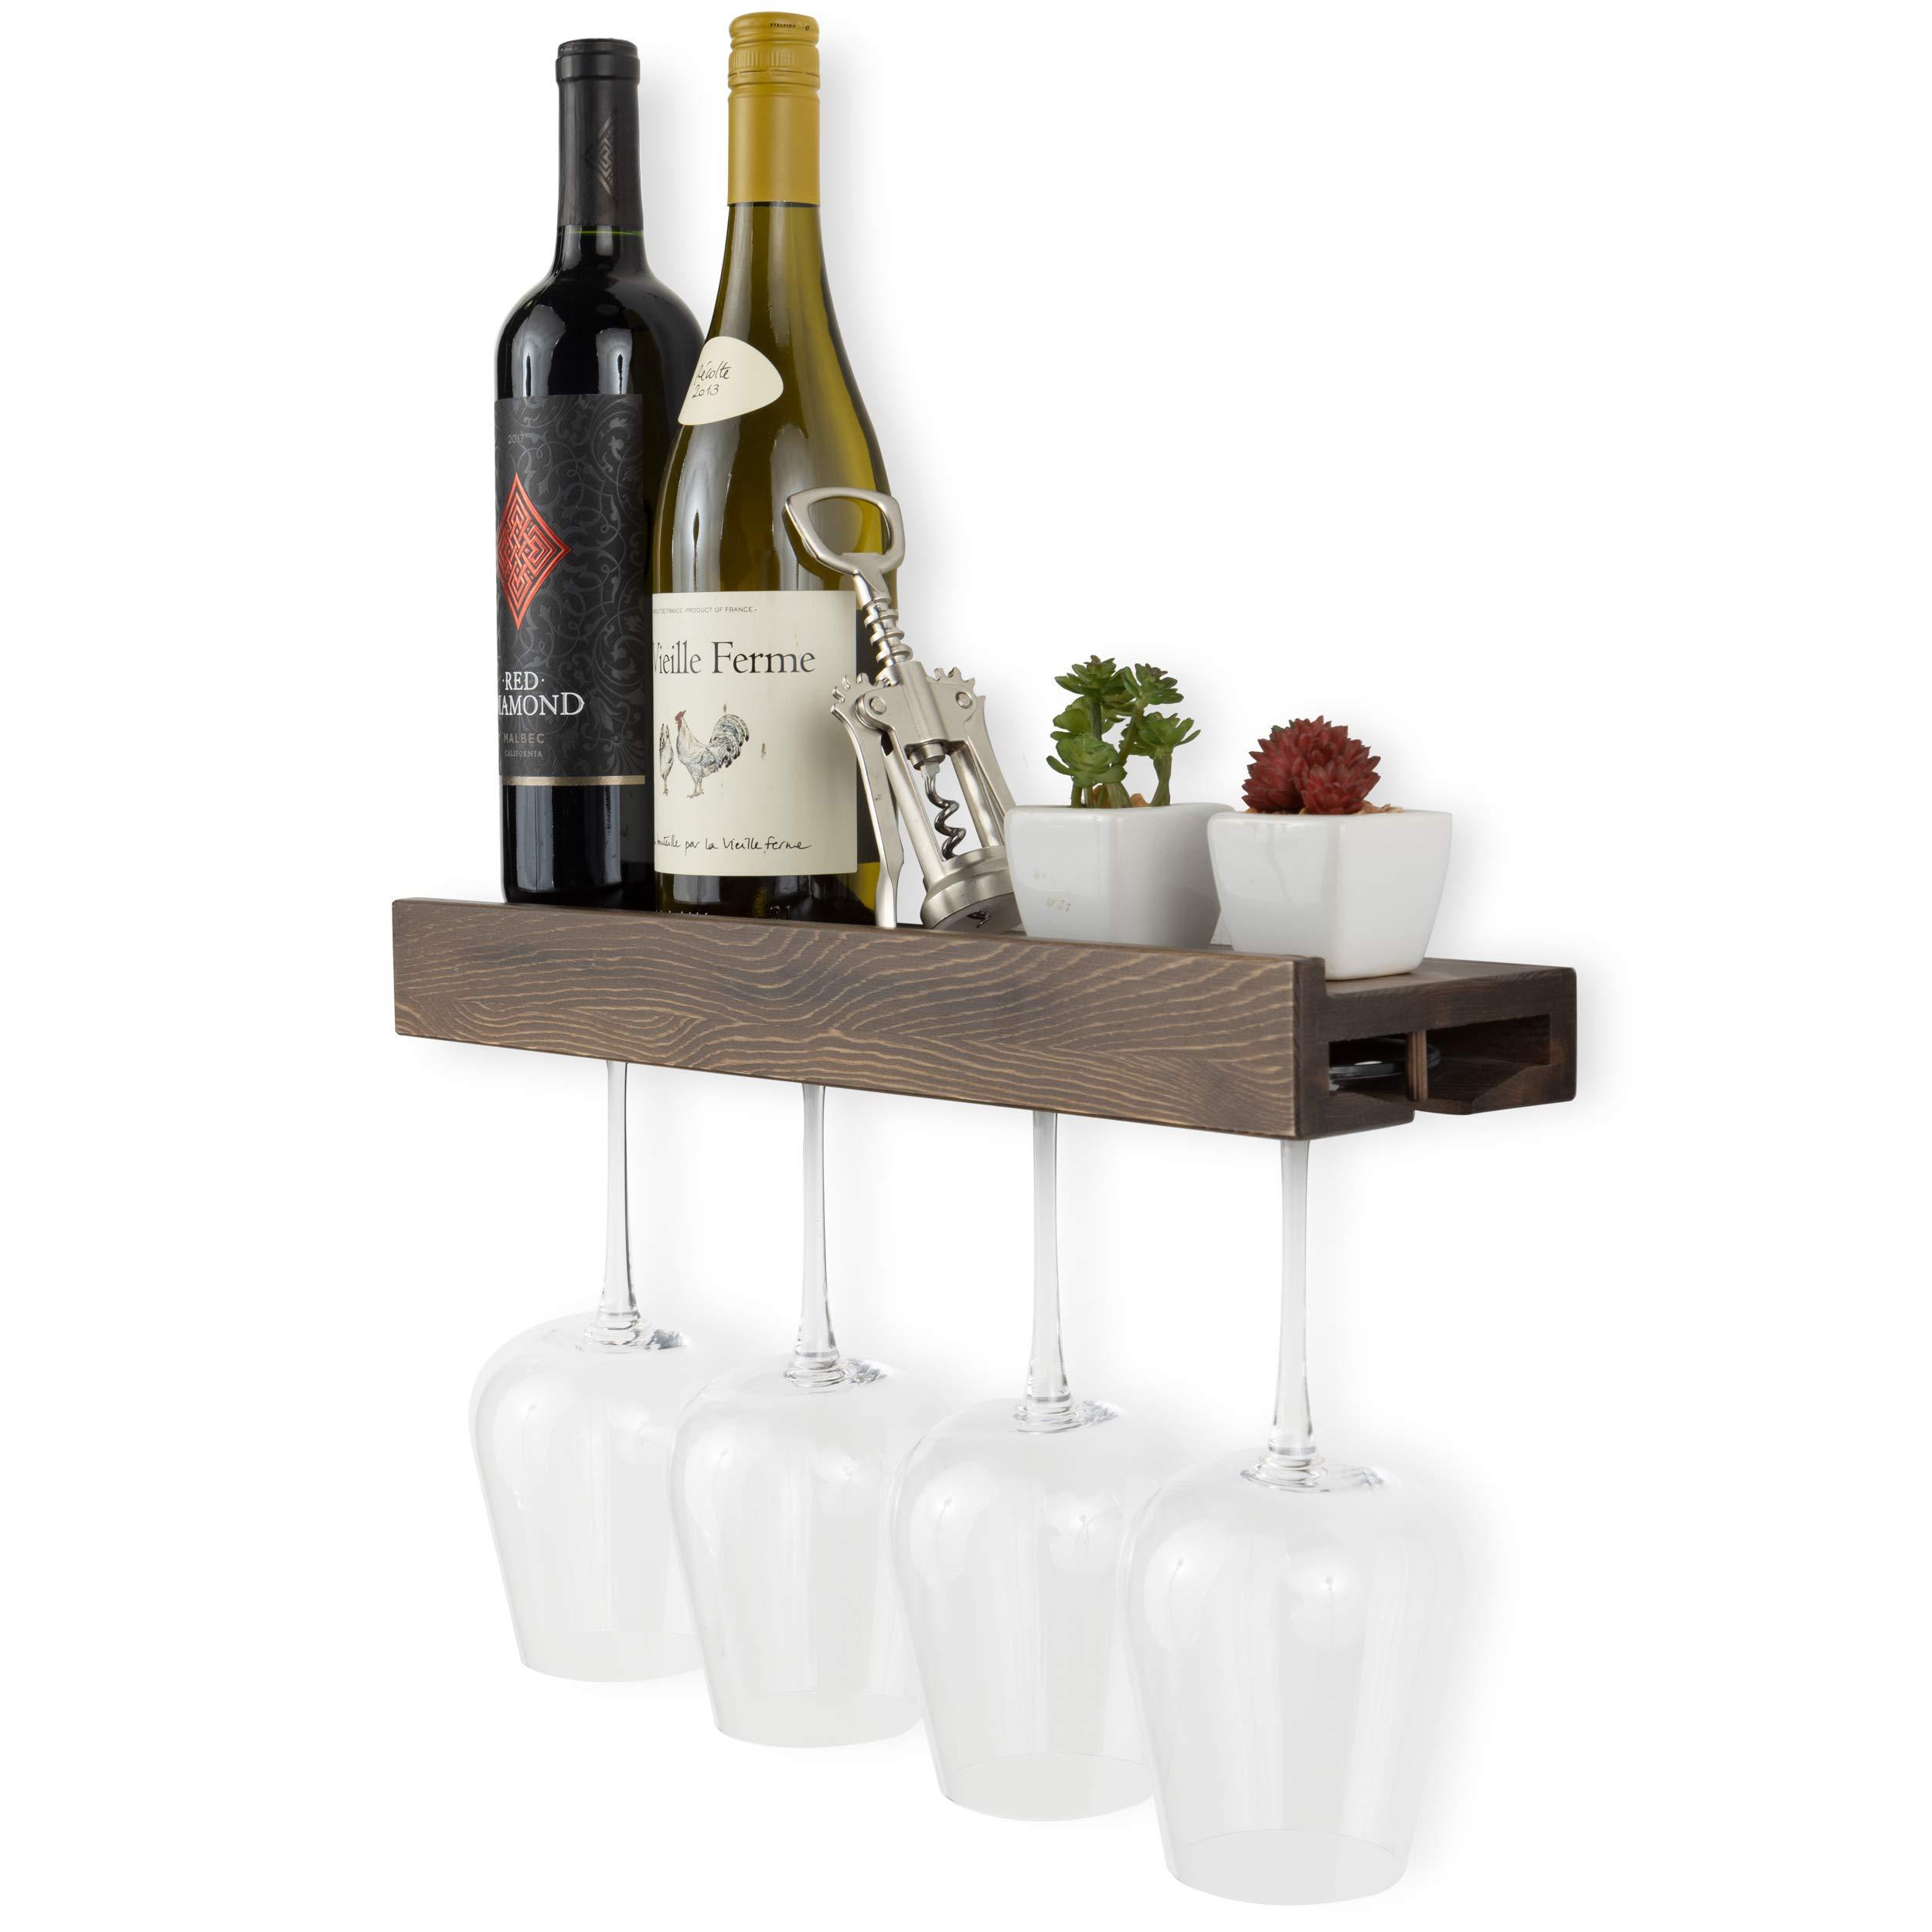 Rustic State Smith Wall Mounted Wood Wine Bottle and Wine Glass Holder Stemware Rack Storage Walnut